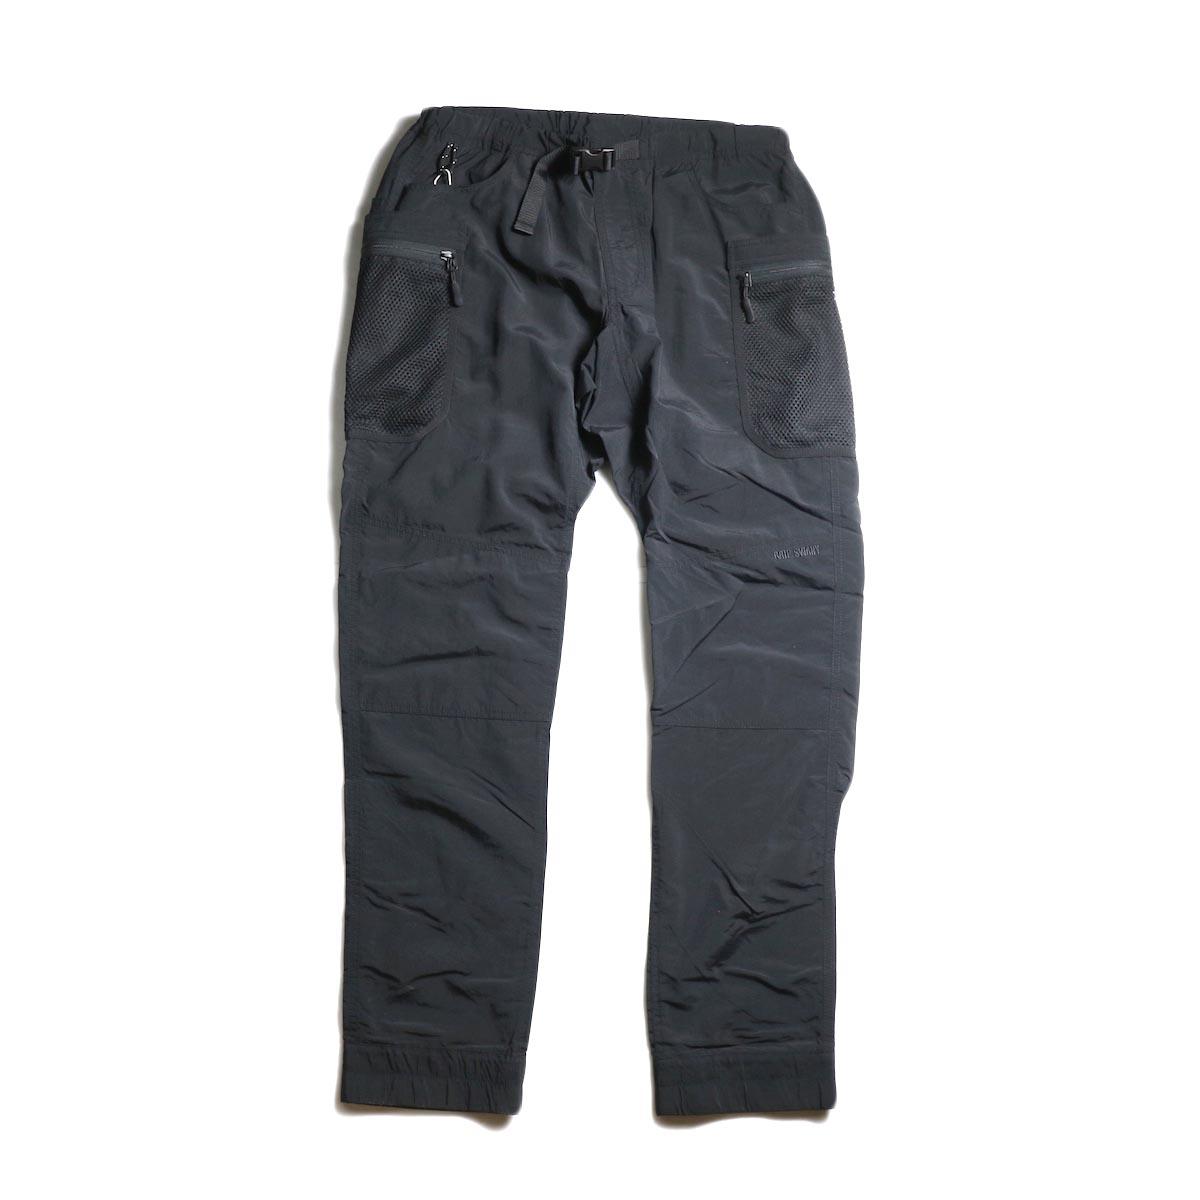 HOBO / SUPPLEX® Nylon Gardener Pants by GRIP®SWANY (Black)